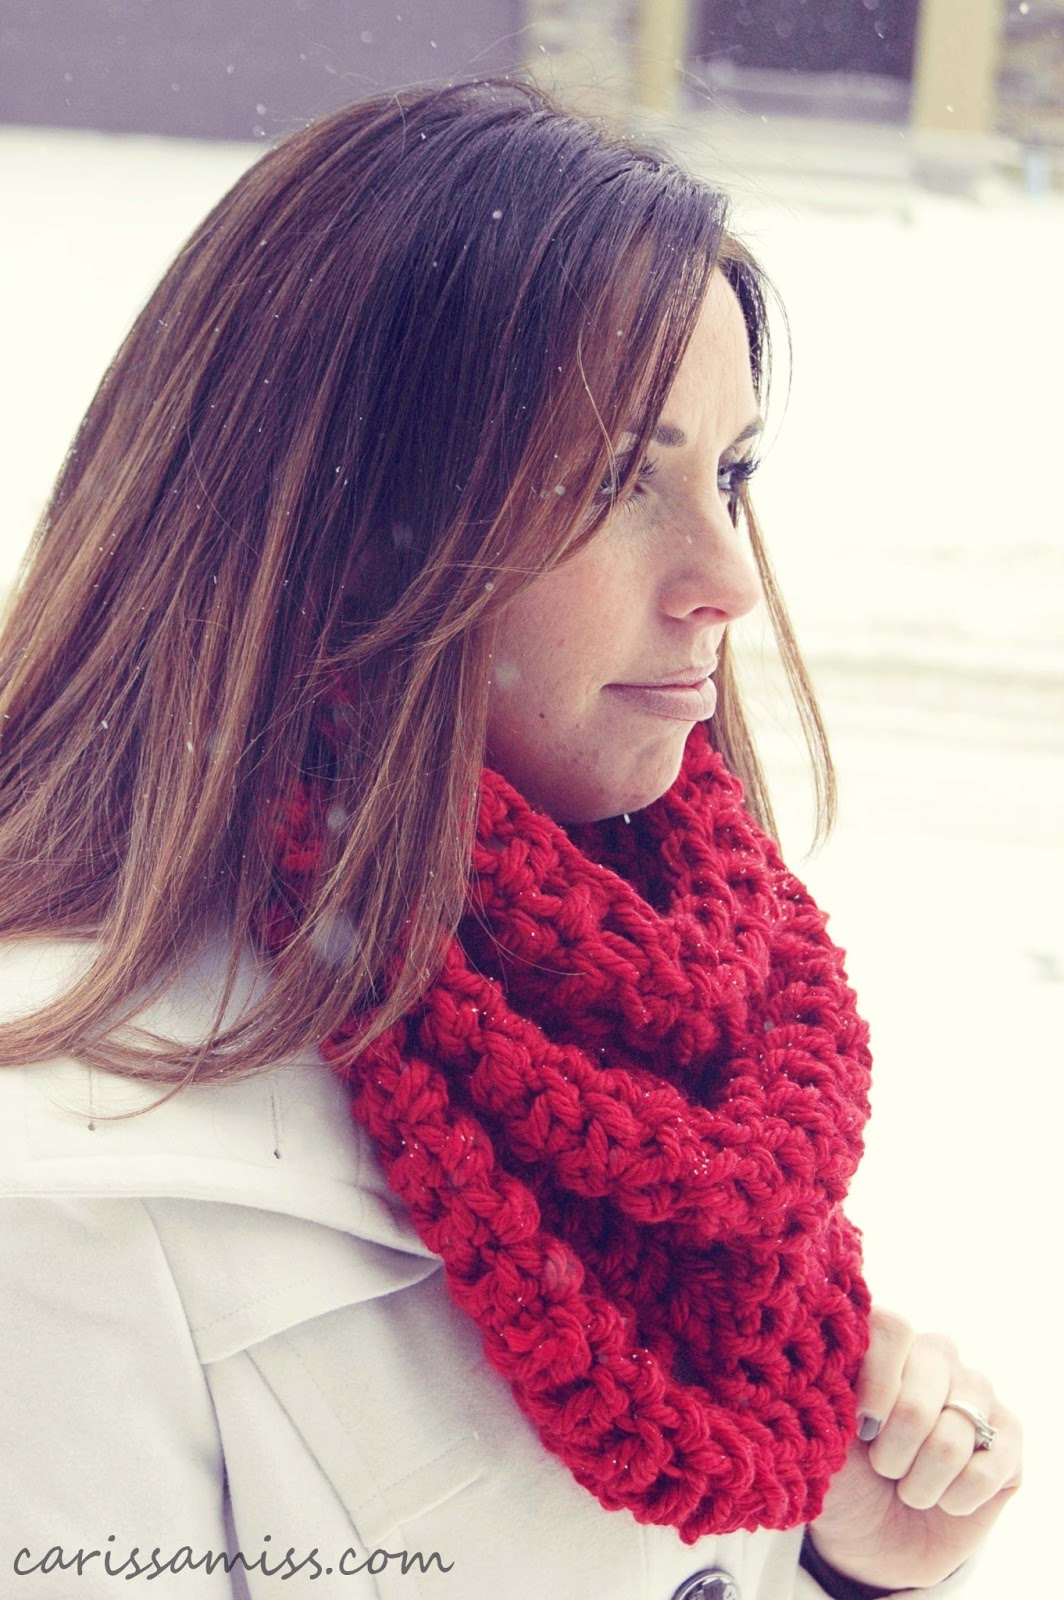 Crochet Infinity Scarf Free Tutorial : Crochet Infinity Scarf Tutorial Carissa Miss